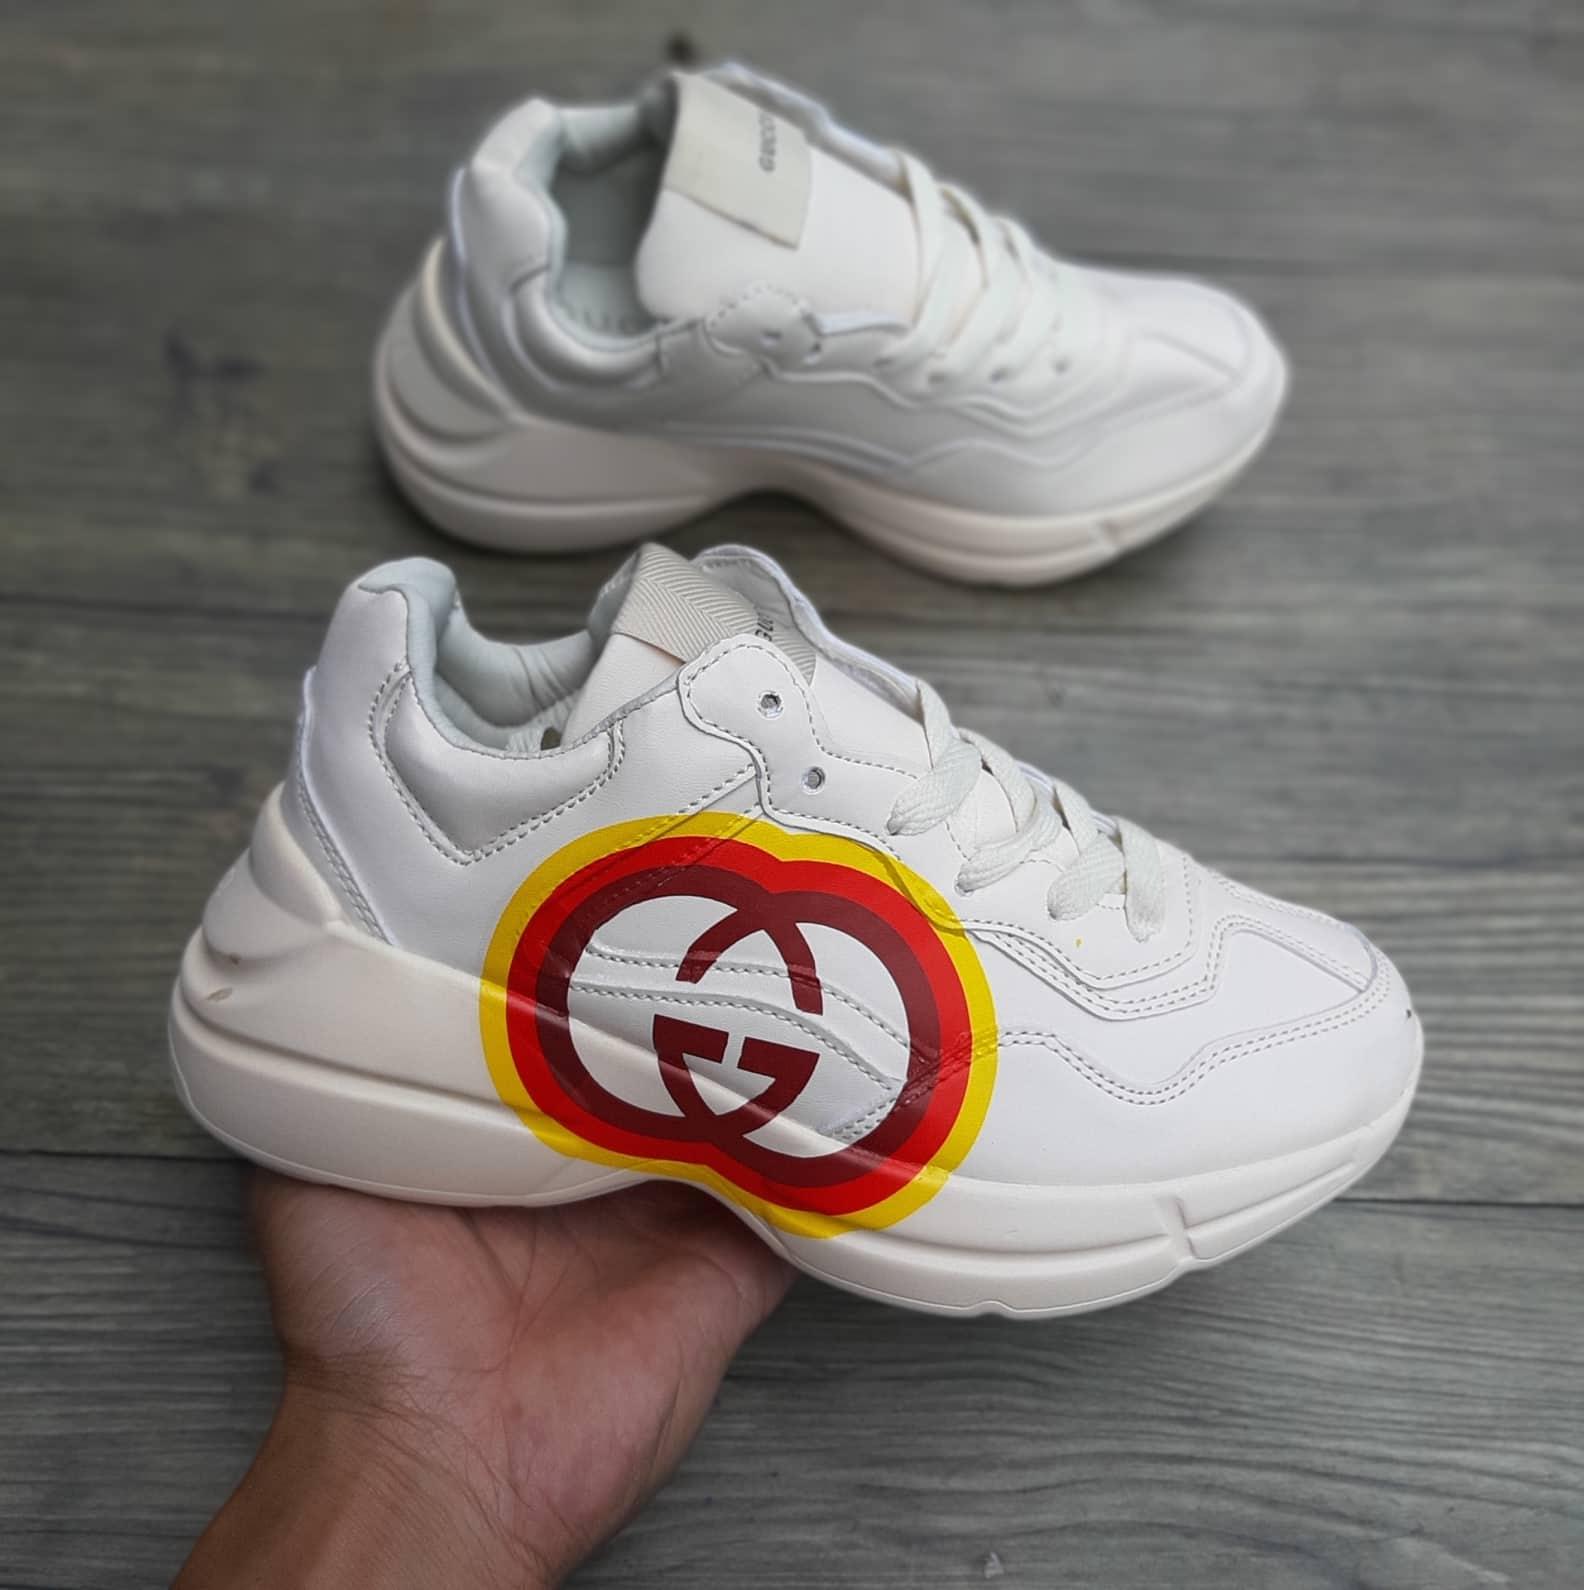 giày thể thao gucci trend mới